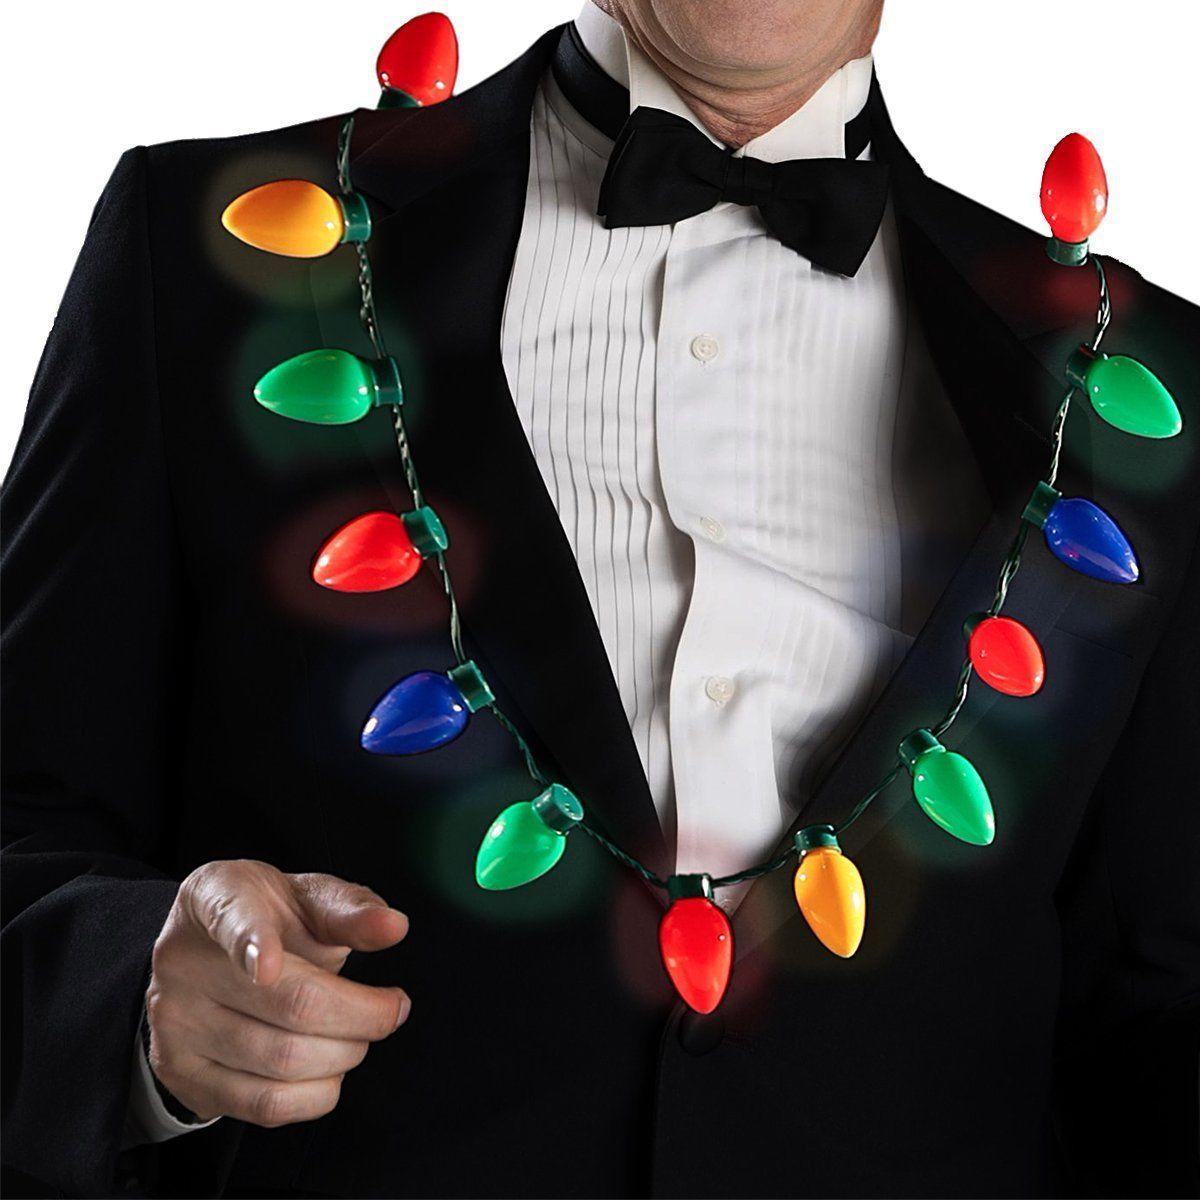 3 flashing modes gentle glow flashing quick bright flashing quicker keep lighting - Light Up Christmas Tie